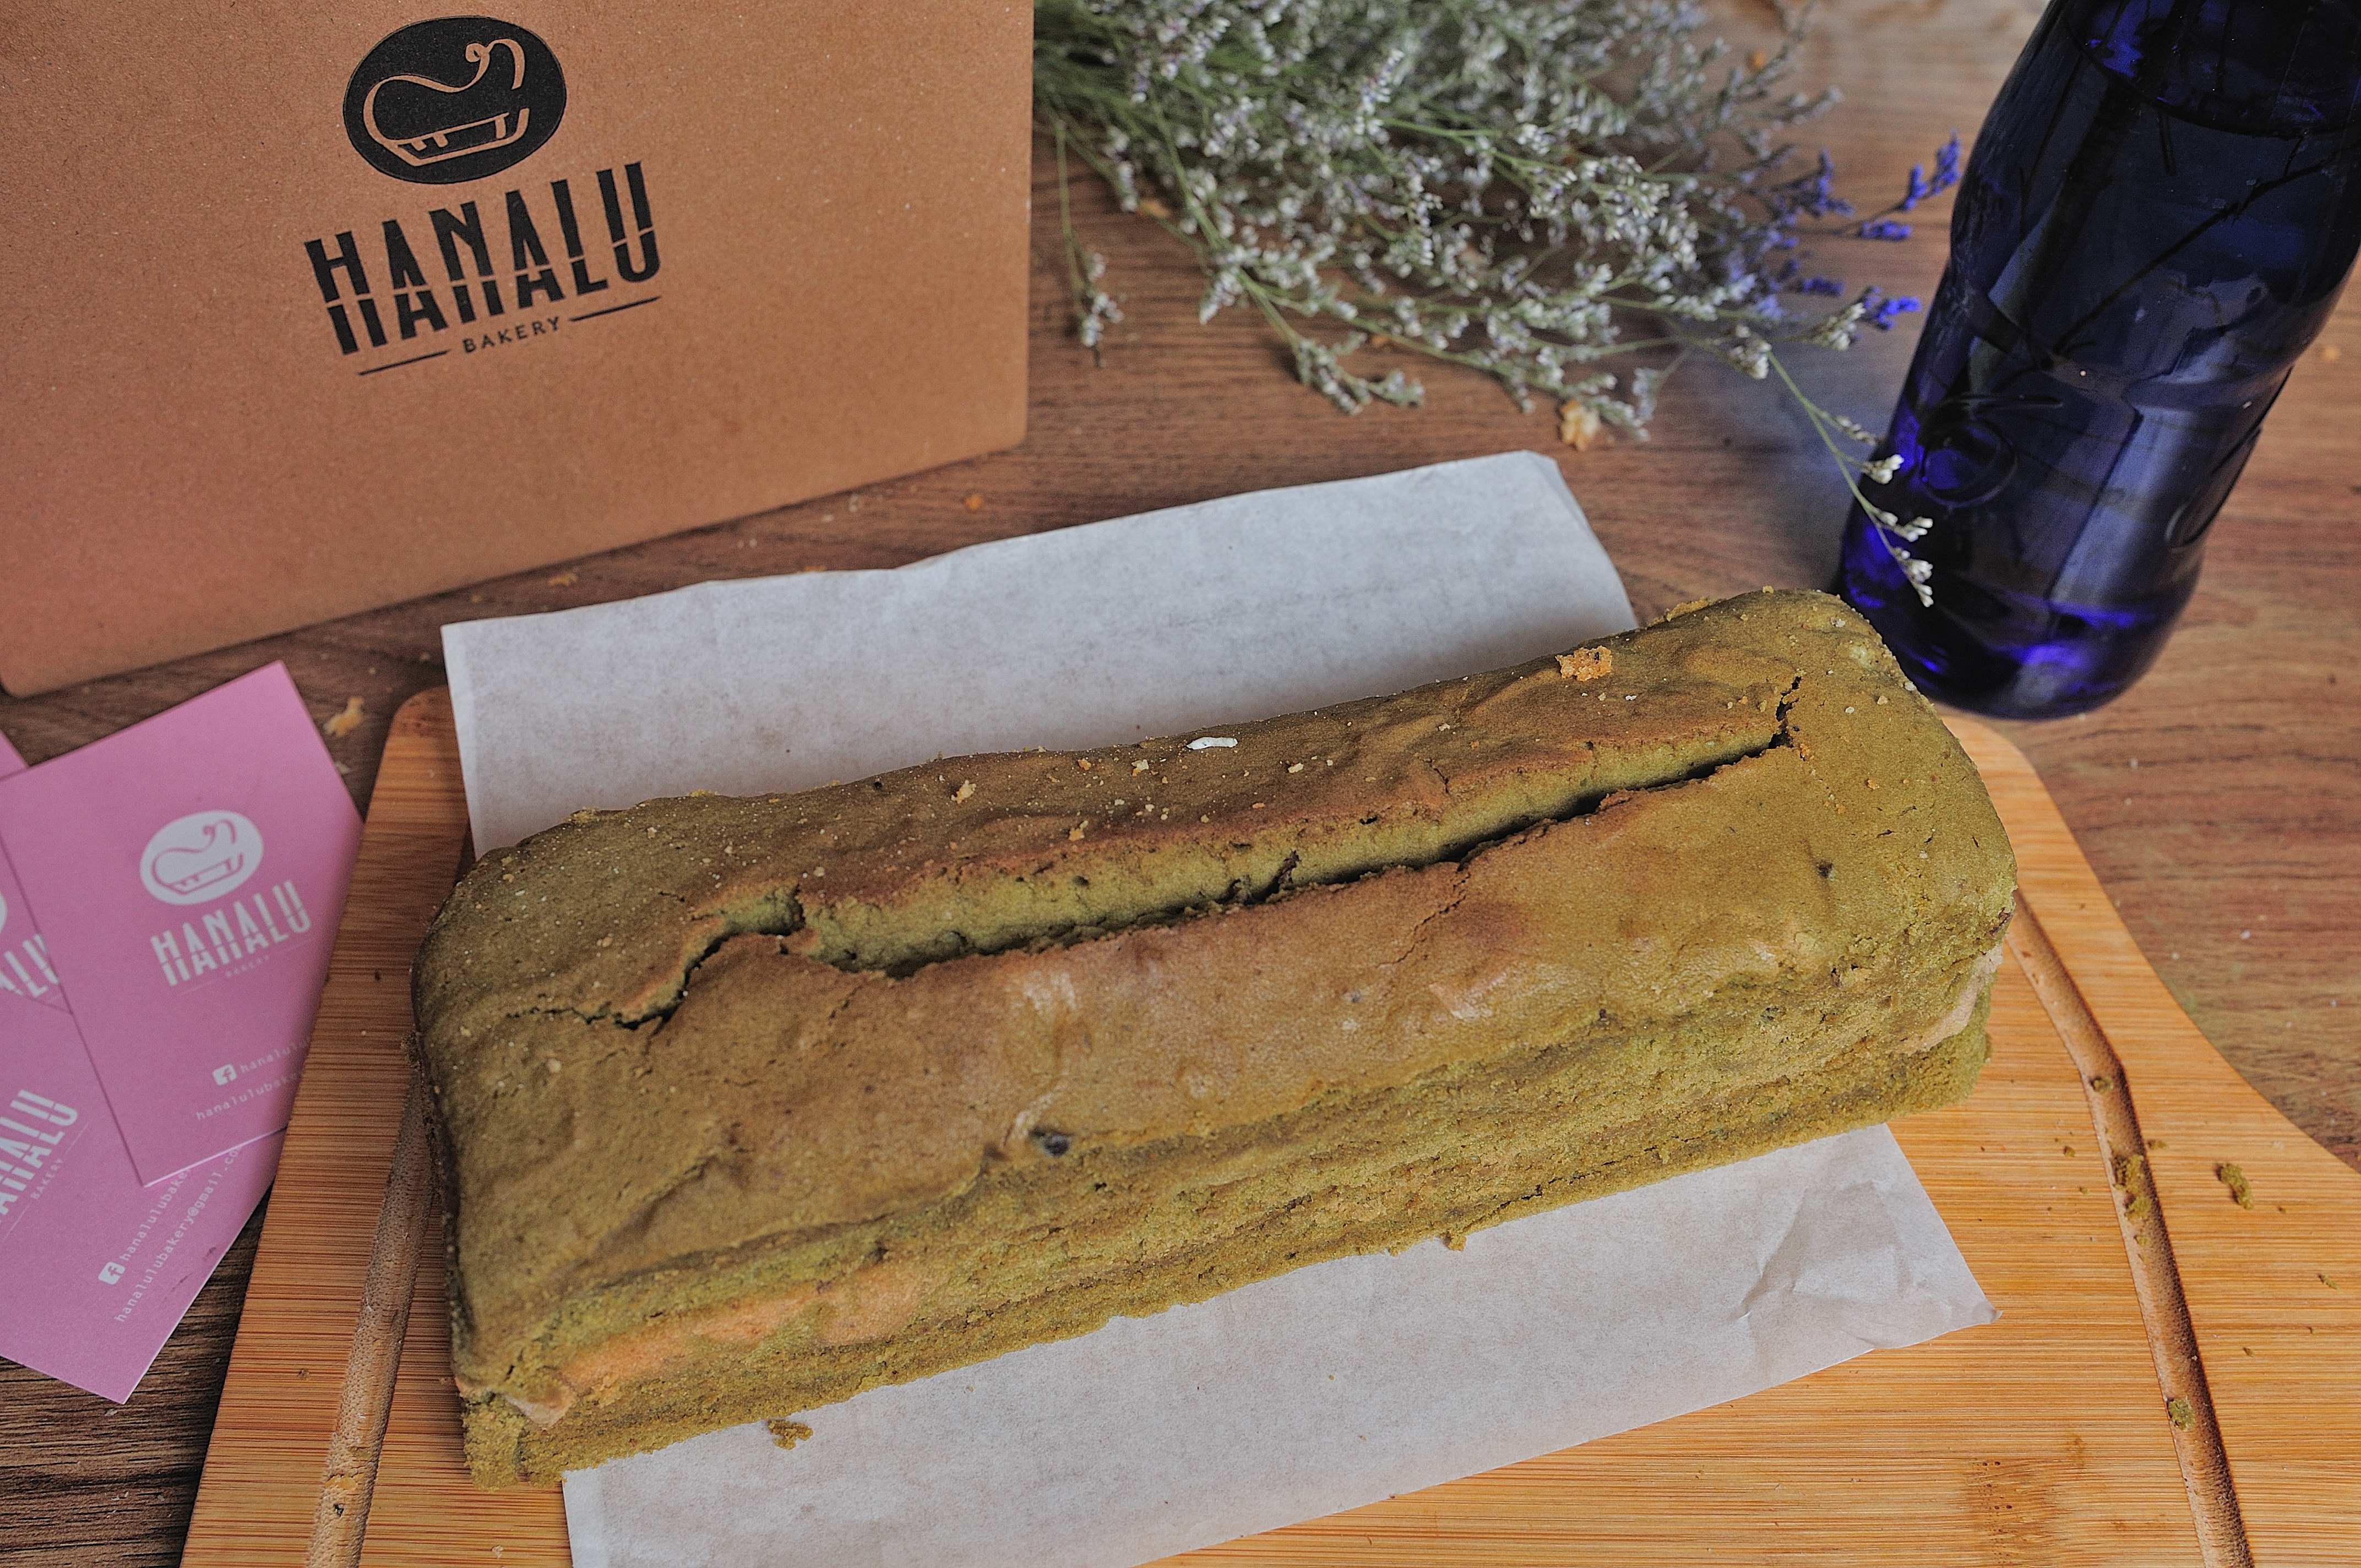 Hanalu Bakery 花露兒烘焙- pound cake 豆抹茶